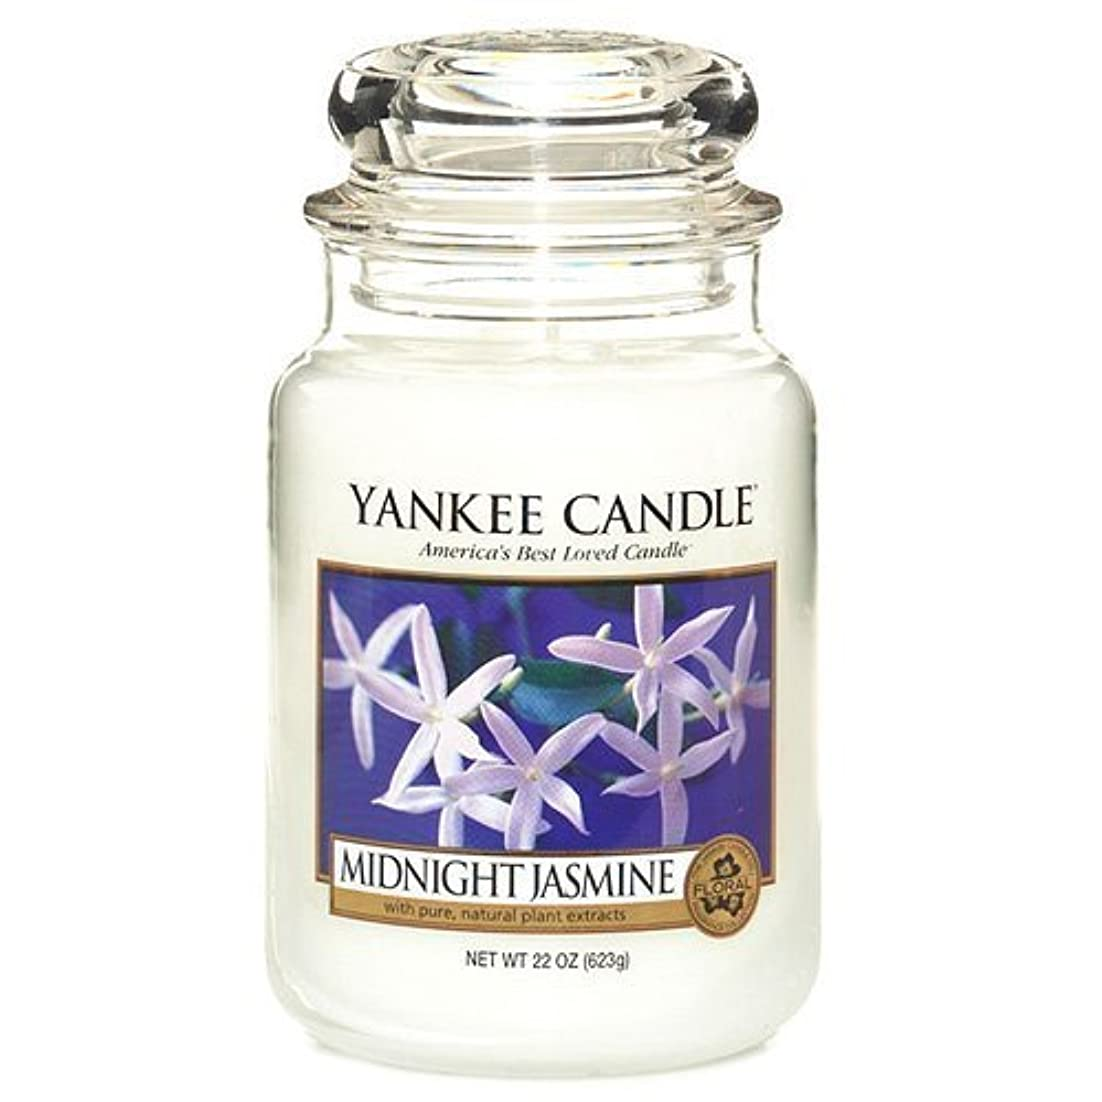 野心的会計士大統領Yankee Candle Housewarmer Jar (Midnight Jasmine) - Large (22 oz) by Yankee Candle [並行輸入品]